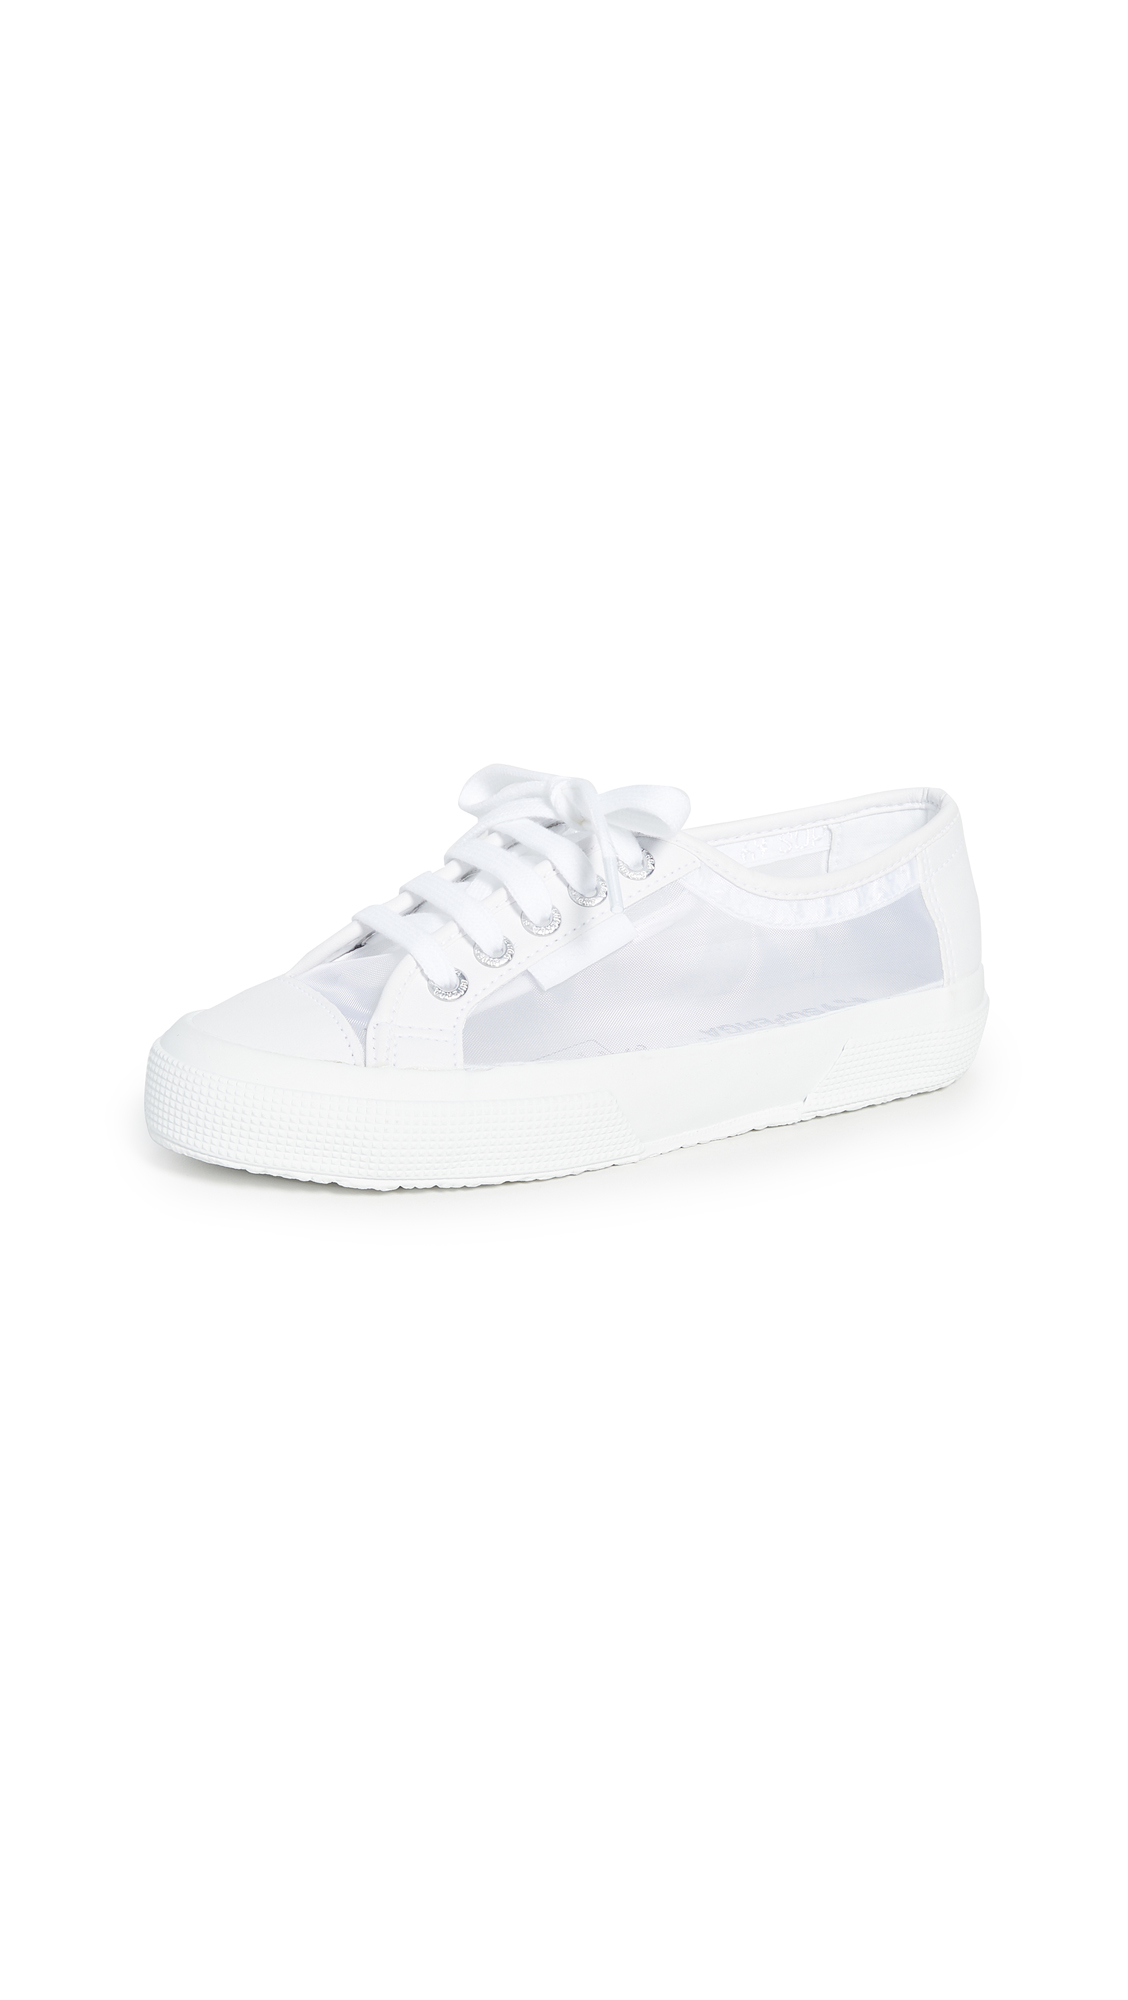 Superga 2750 Mesh Sneakers - 25% Off Sale